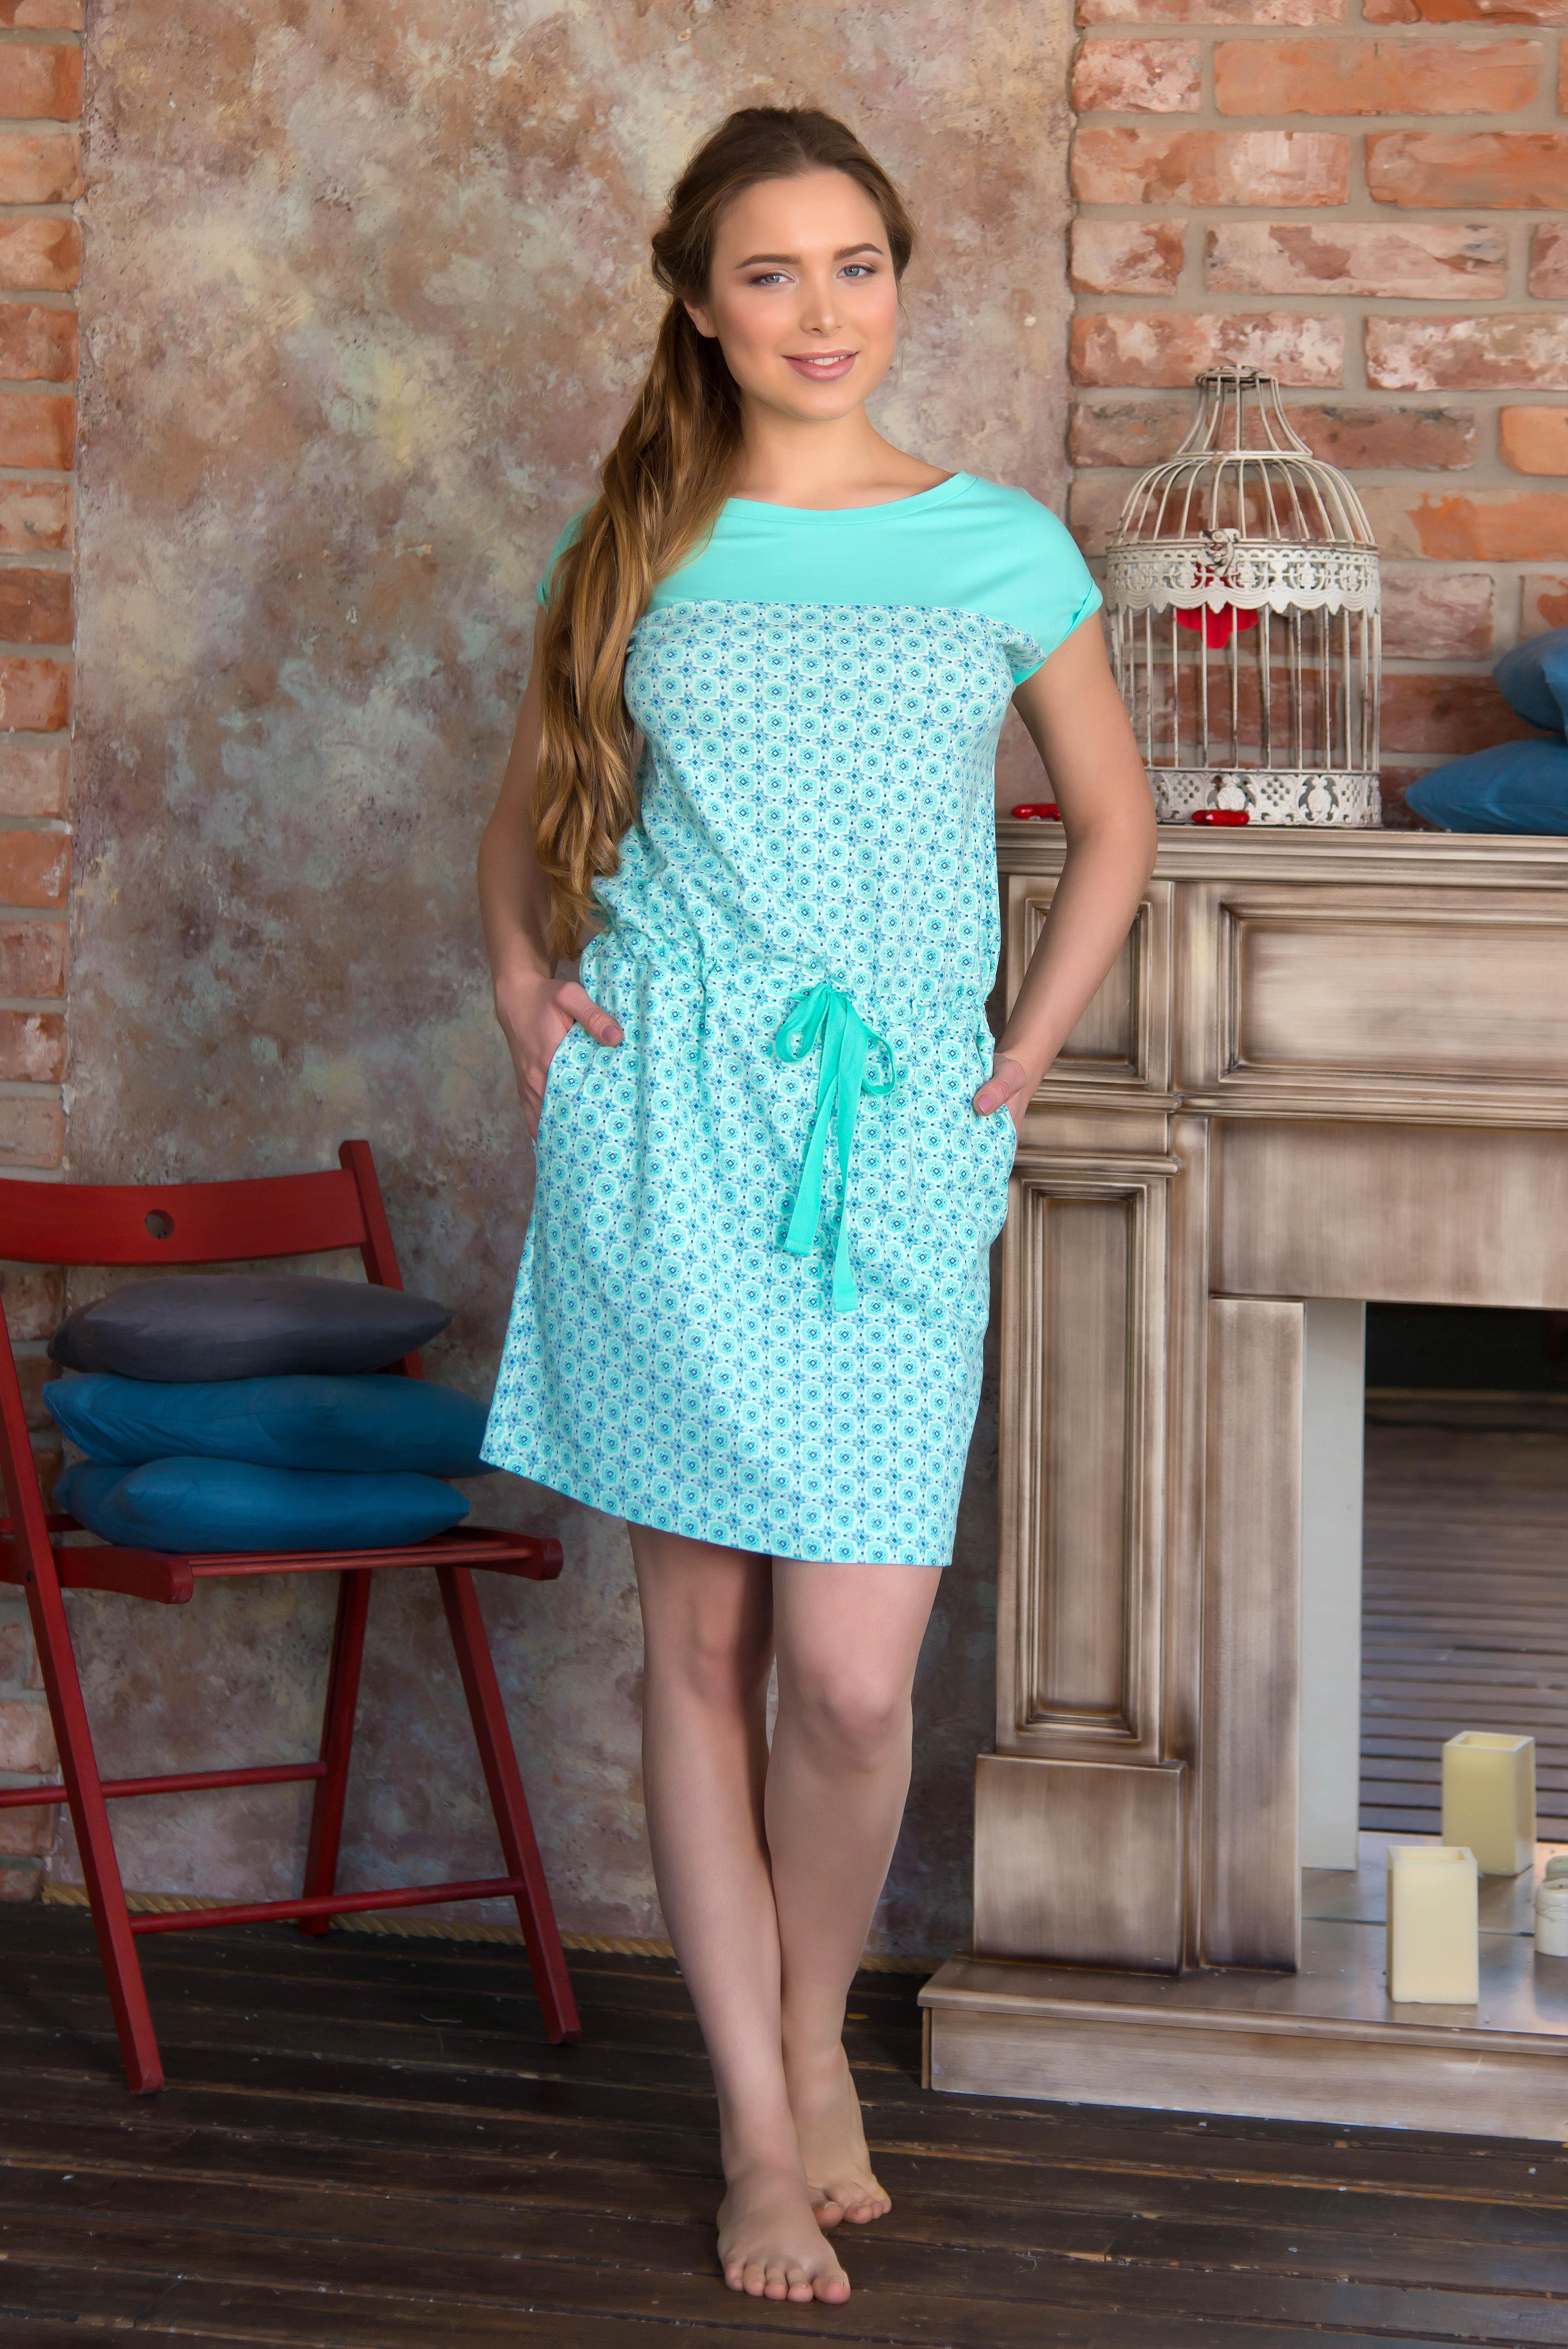 Туники, сарафаны Mia Cara Платье Isidora Цвет: Ментол (xxxL) пижама женская футболка шорты mia cara portugal цвет розовый голубой aw16 mc 813 размер 50 52